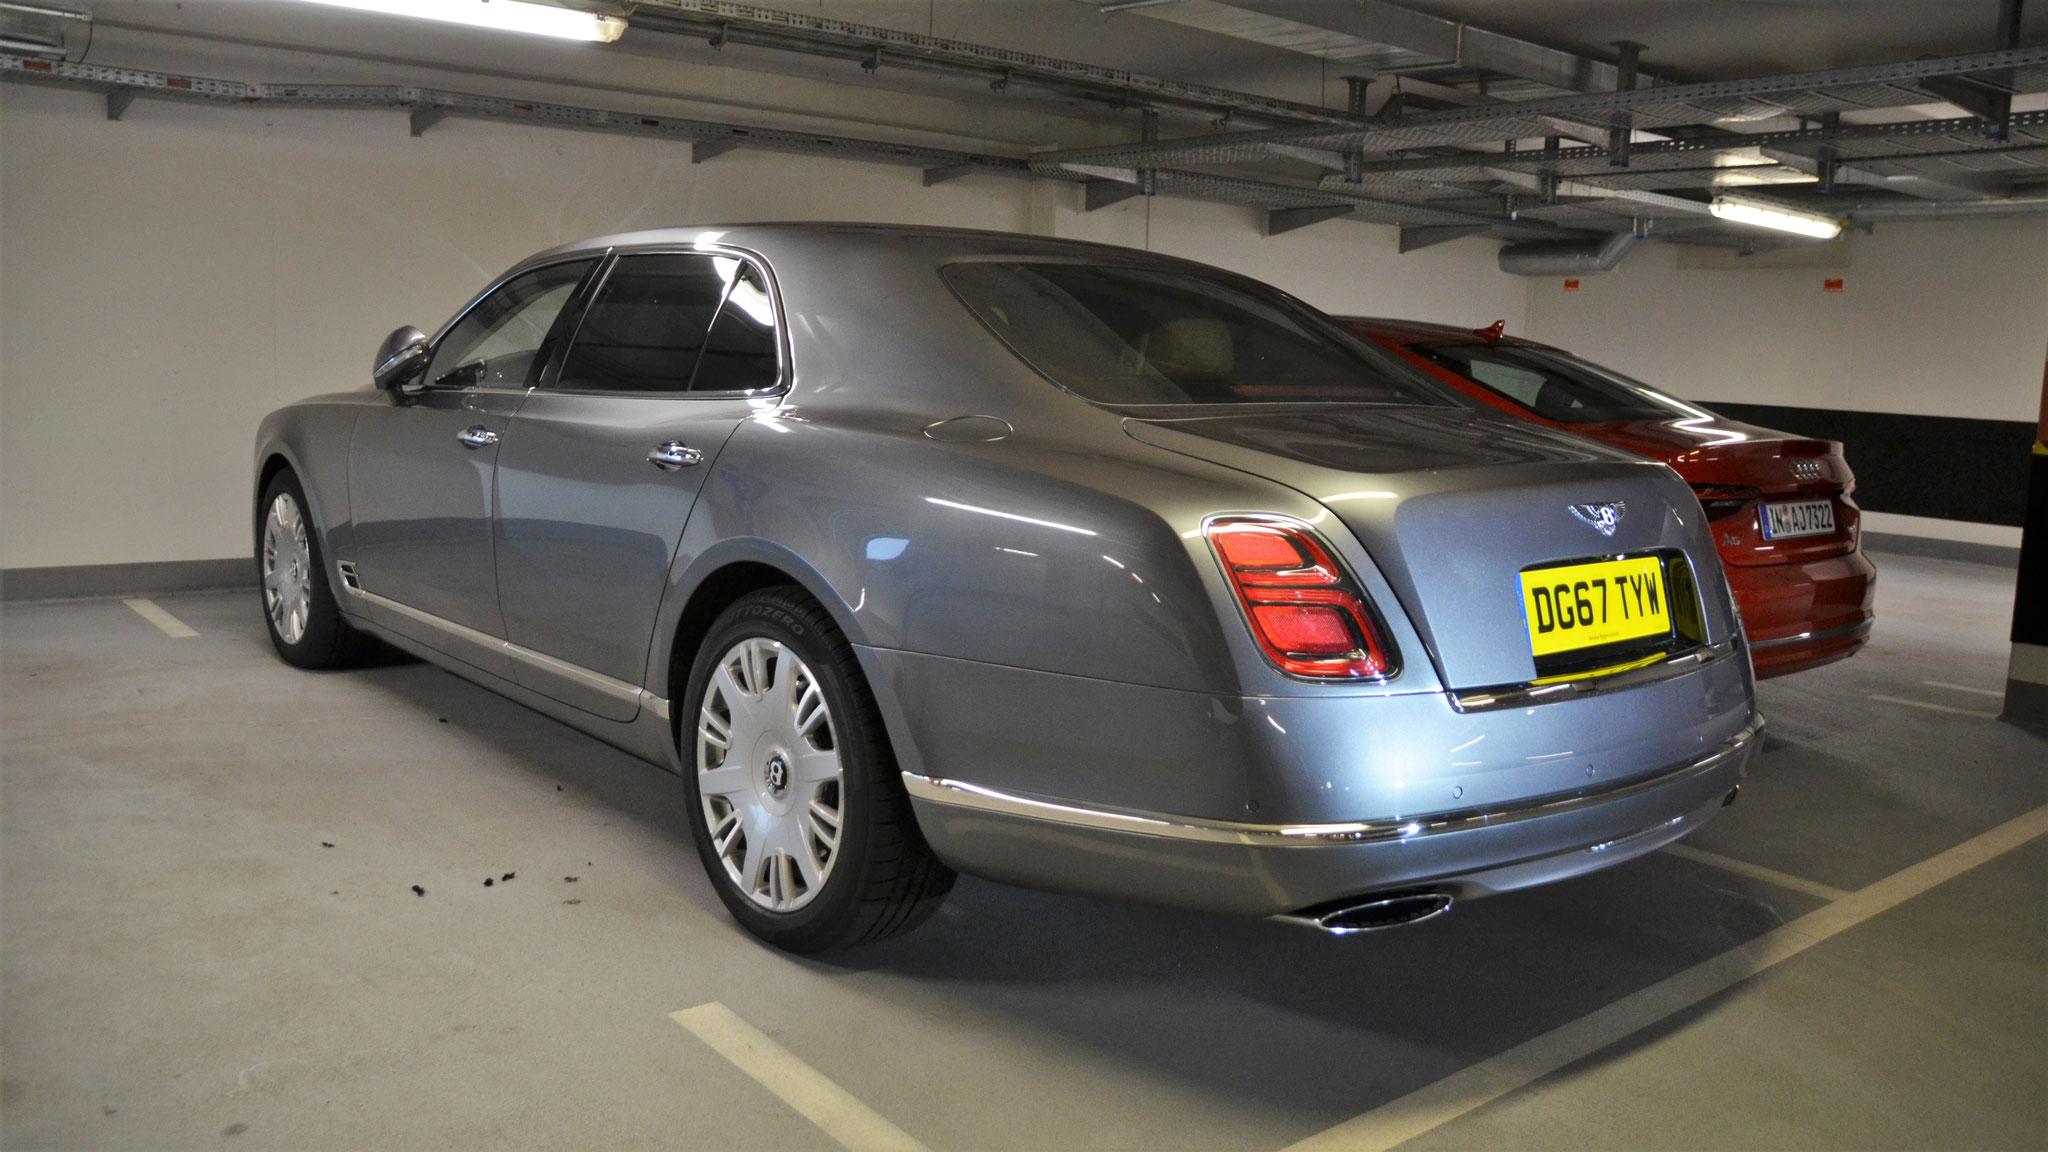 Bentley Mulsanne - DG67-TYW (GB)